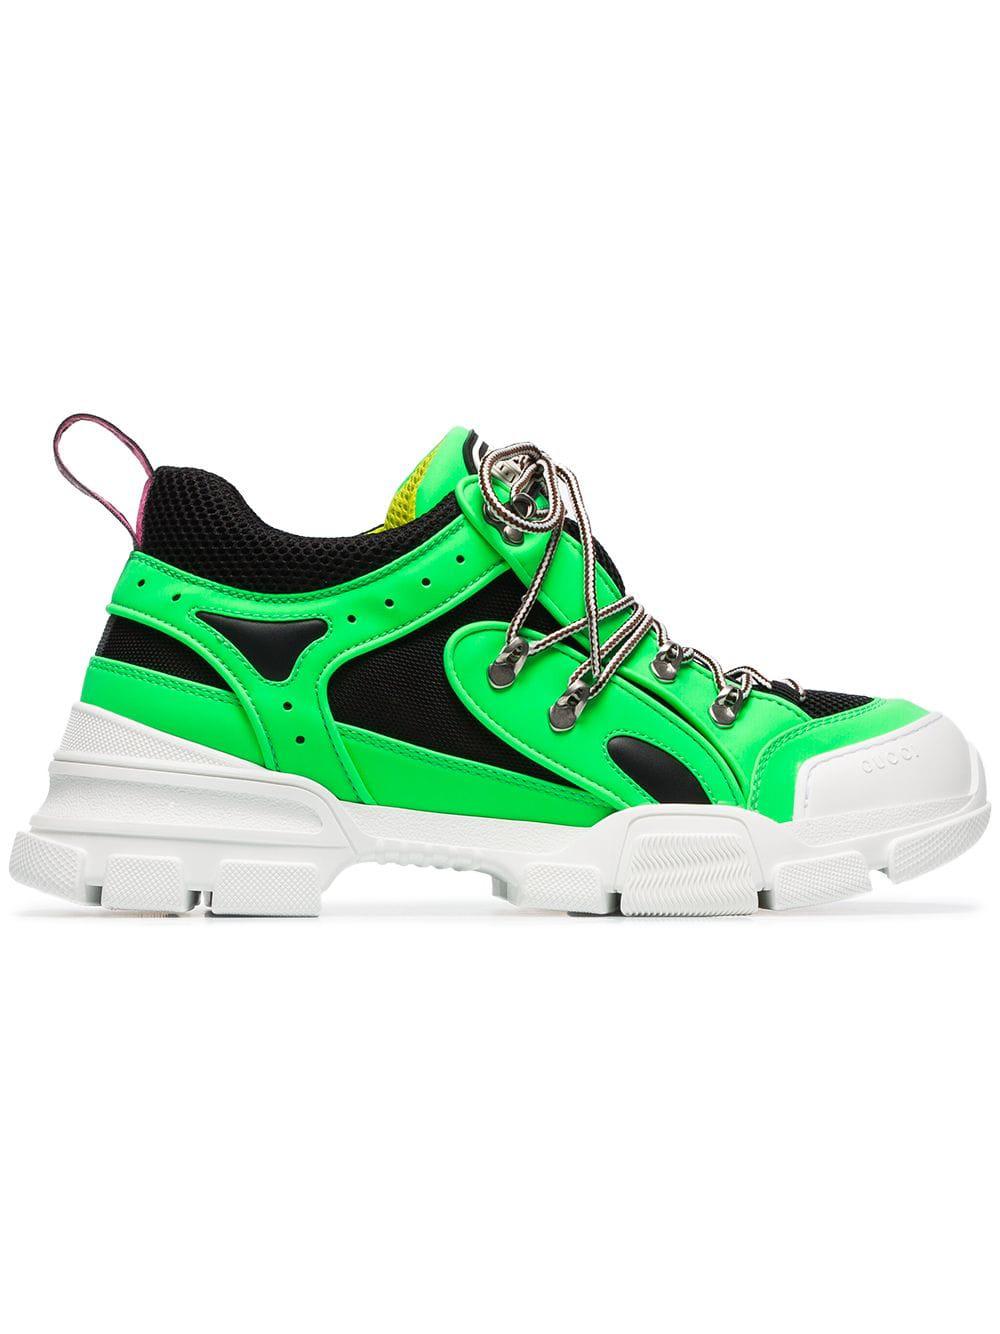 bda14b0f138 Gucci Men s Flashtrek Reflective Sneakers In Green